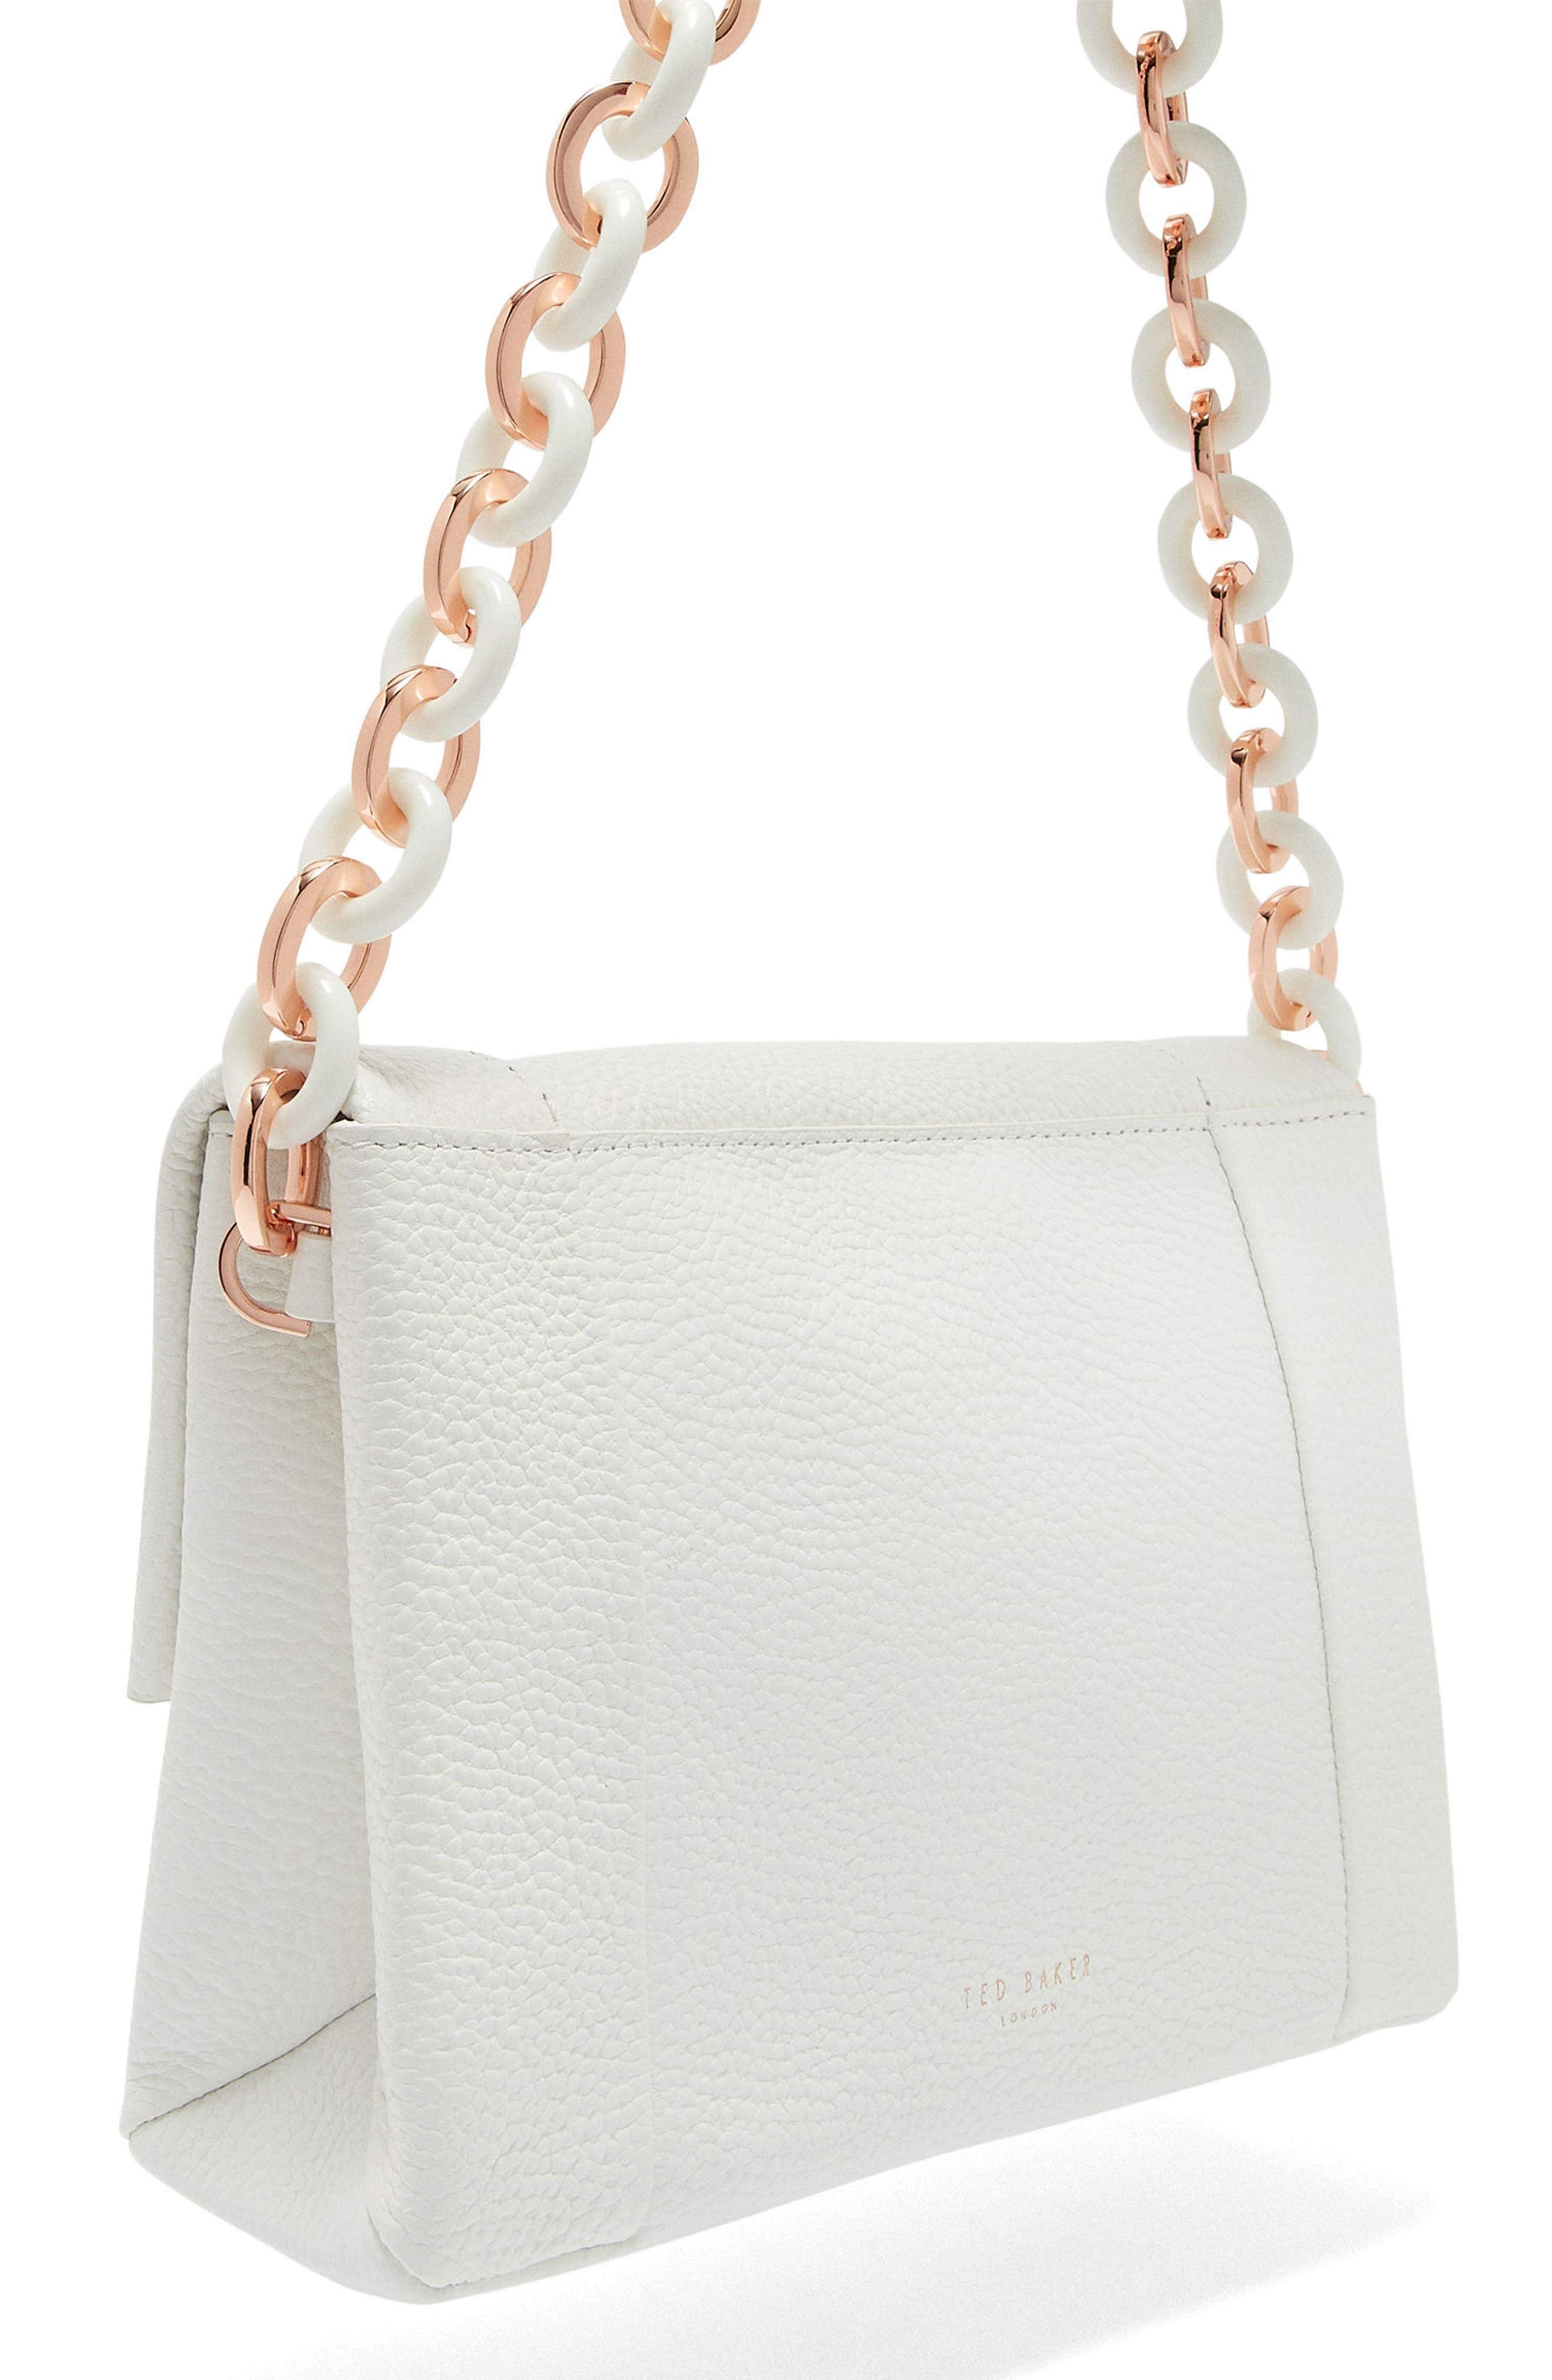 Ipomoea Leather Shoulder Bag,                             Alternate thumbnail 5, color,